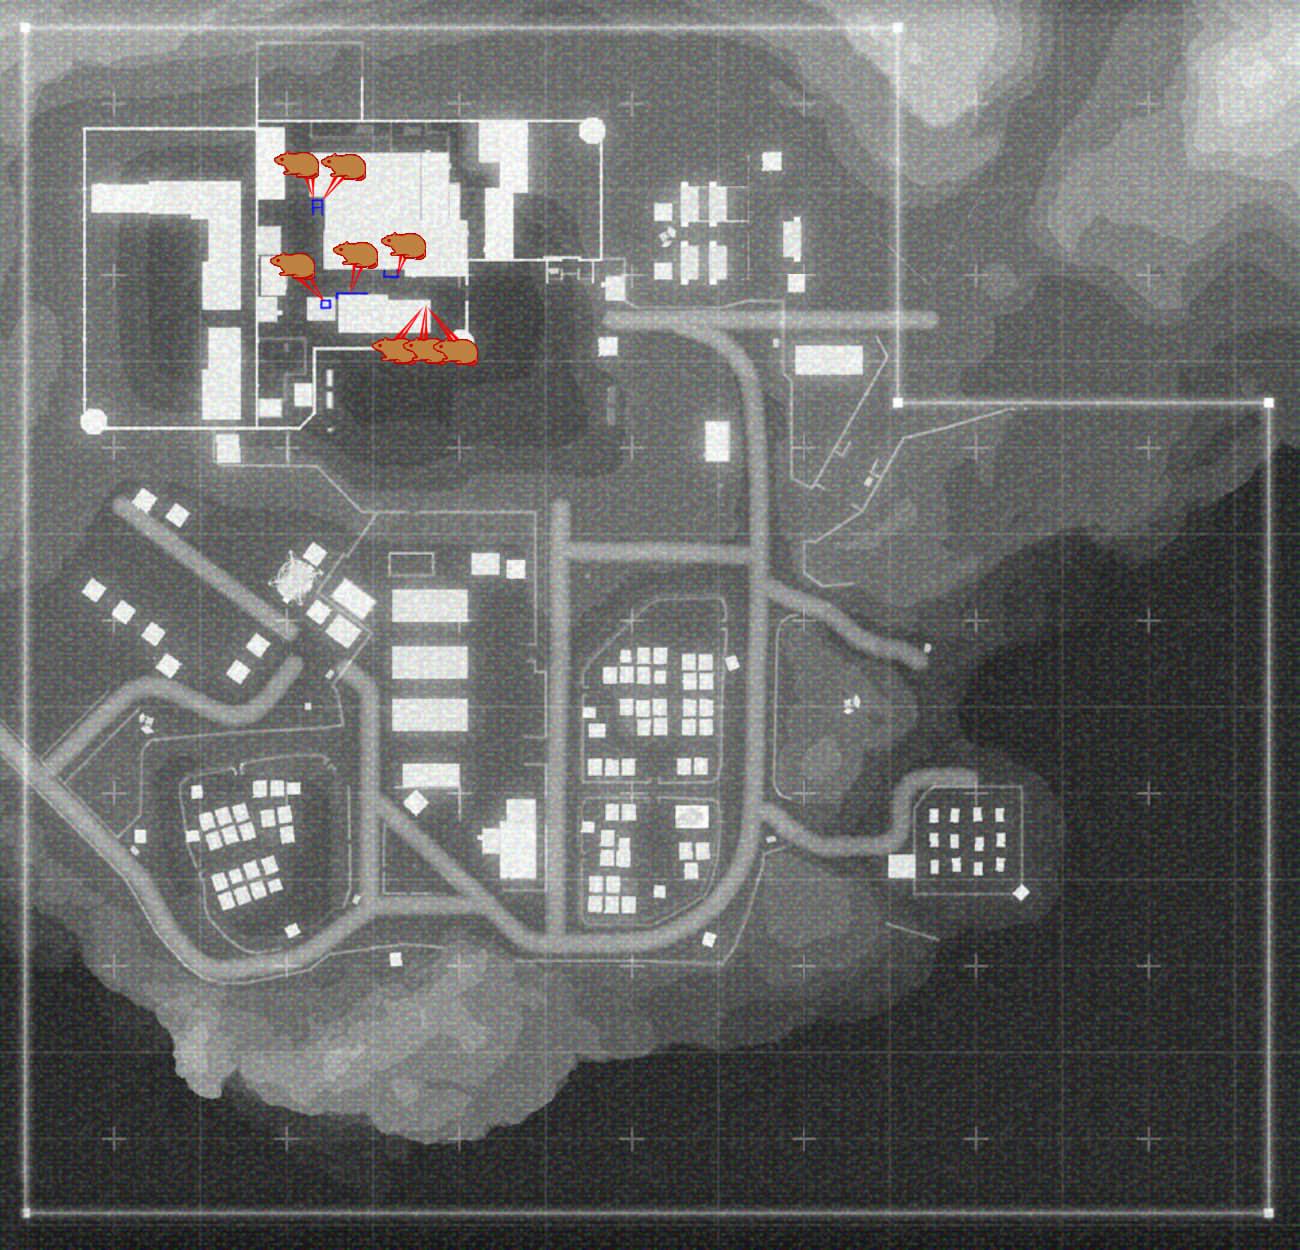 ratmap.jpg